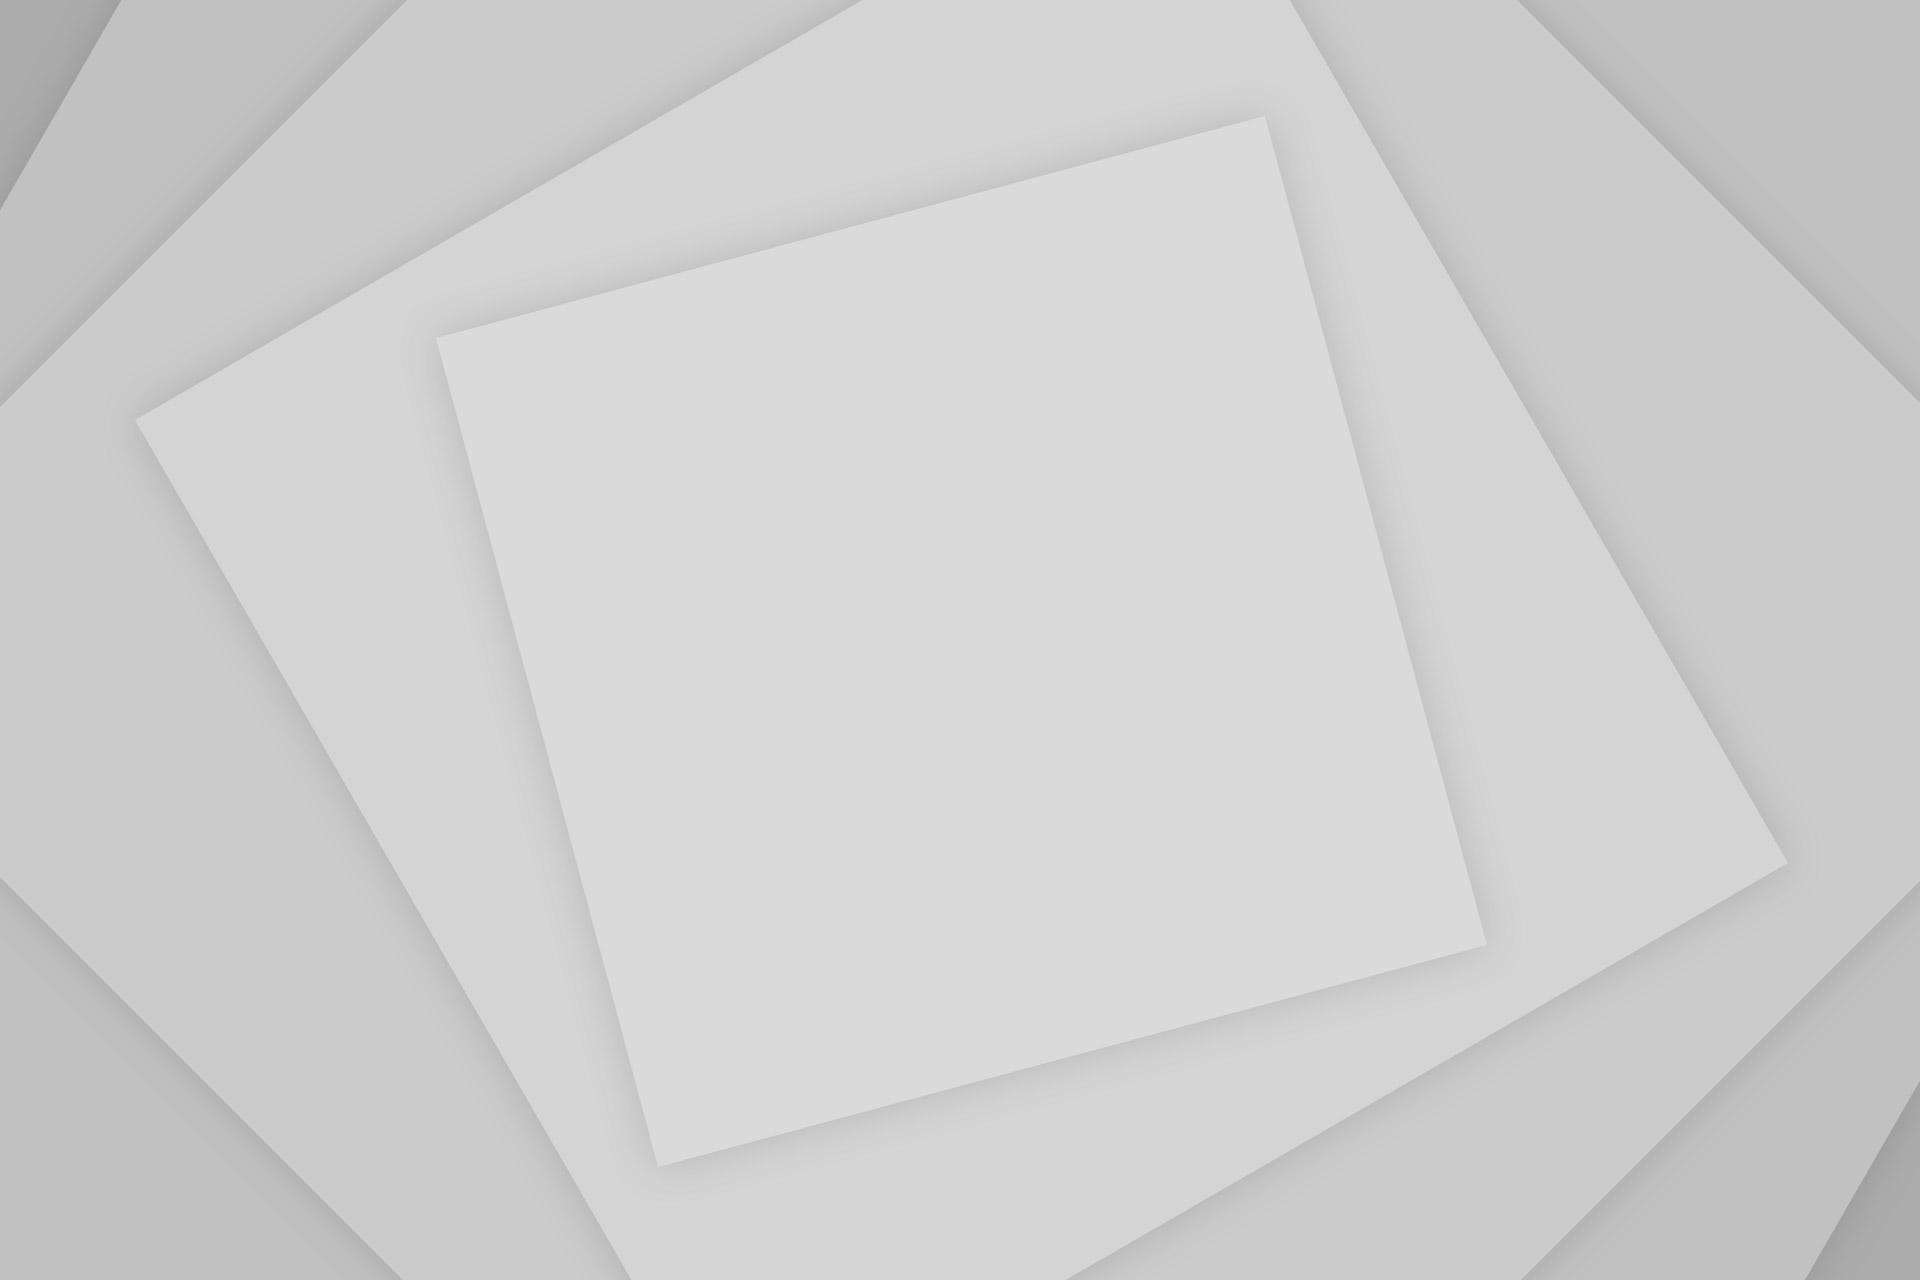 GORI INTERNET, BIVŠI PAR NA UDARU HAKERA: Procureo eksplicitni video Nicole Scherzinger i Lewis Hamilton-a! (VIDEO)